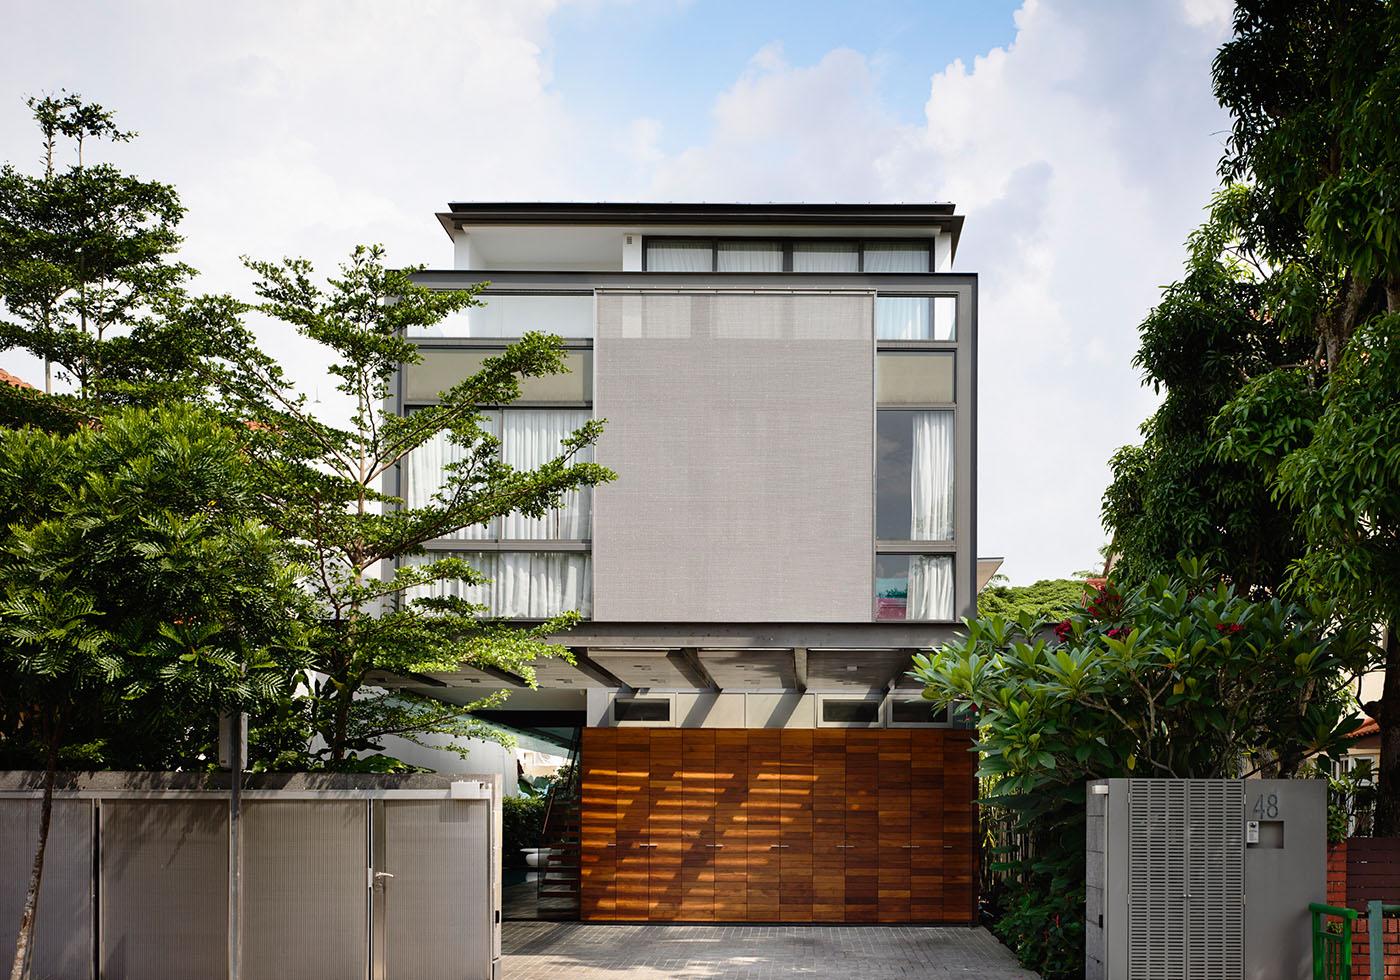 Discreetly Detached Hyla Architects Award Winning Singapore